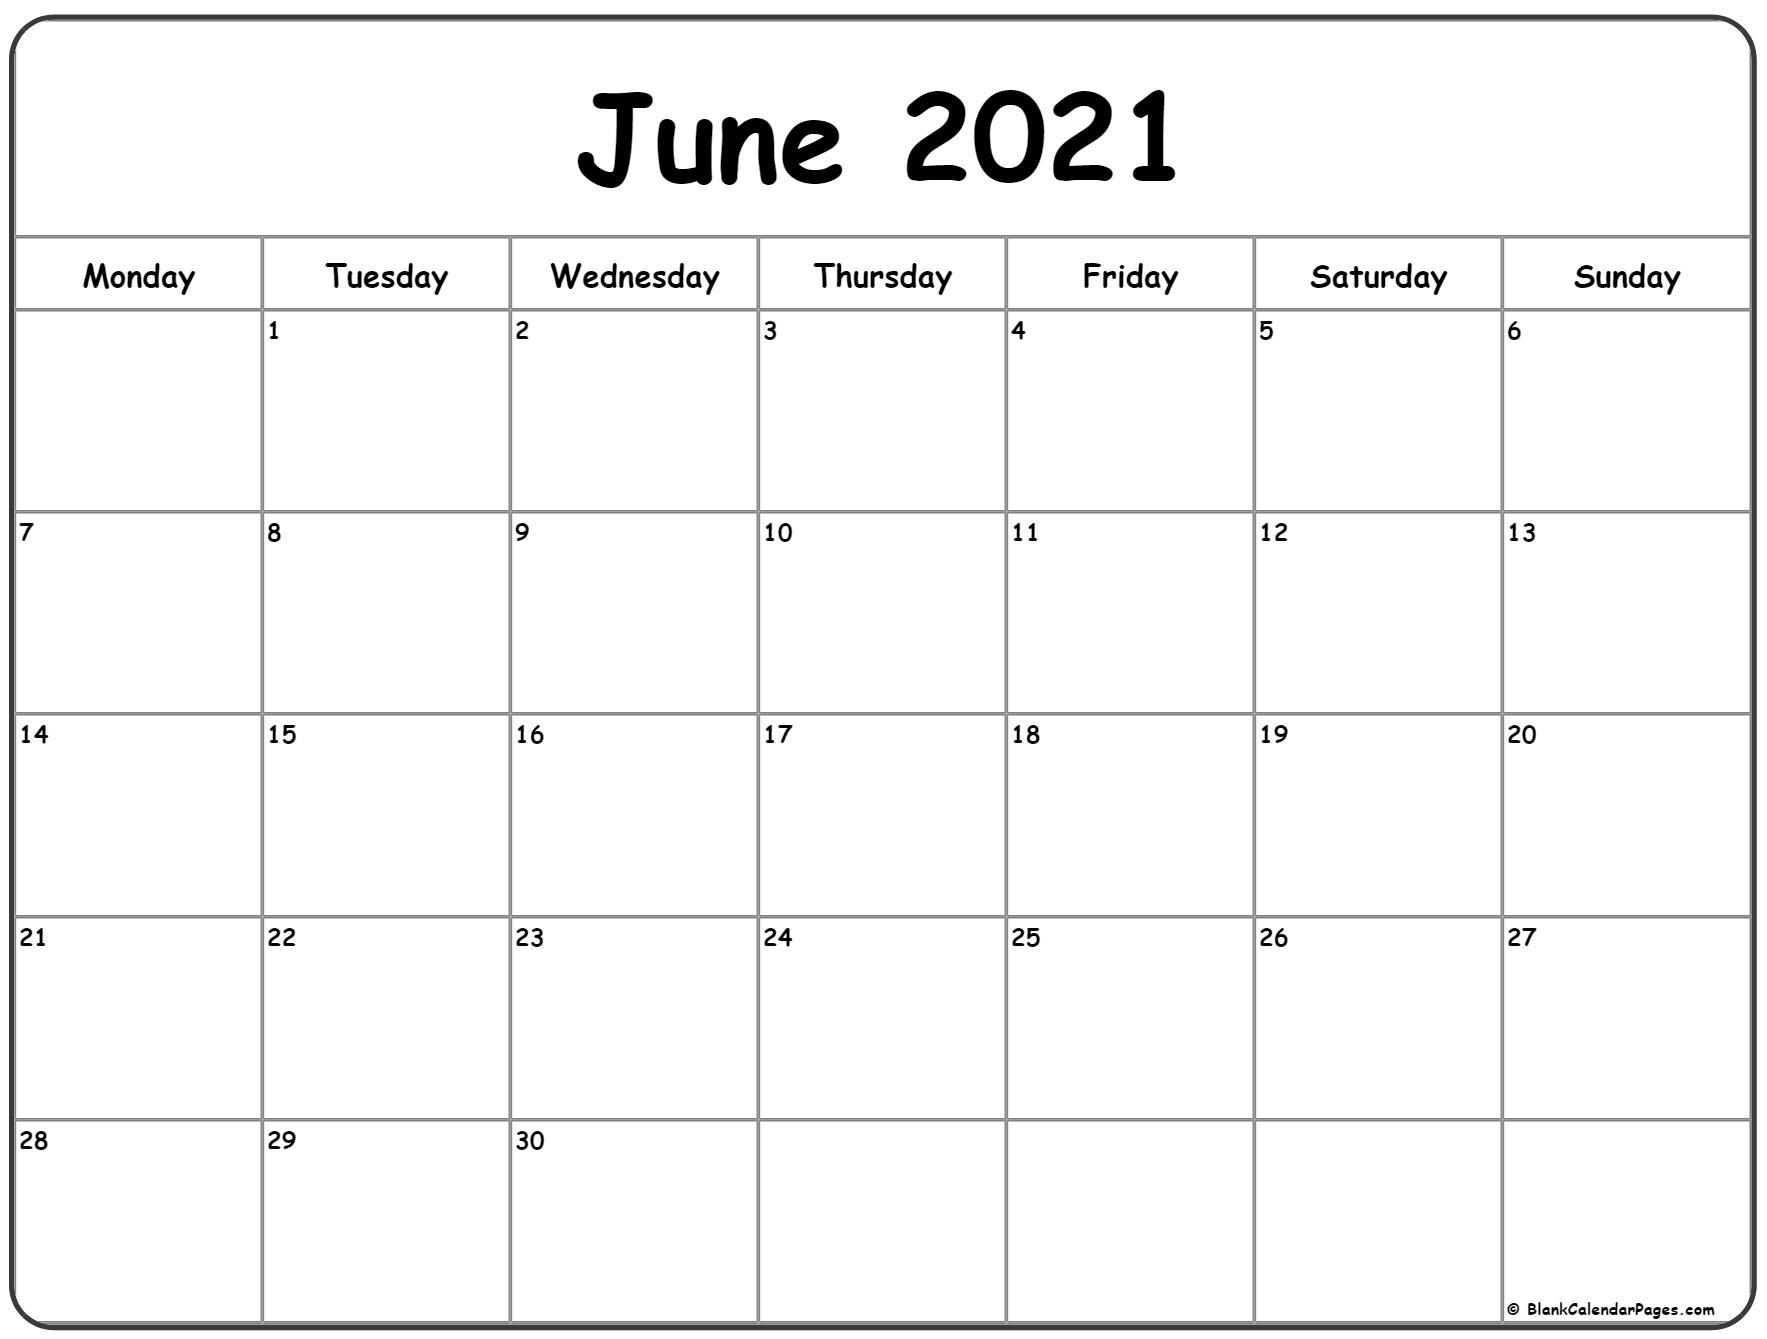 June 2021 Monday Calendar | Monday To Sunday